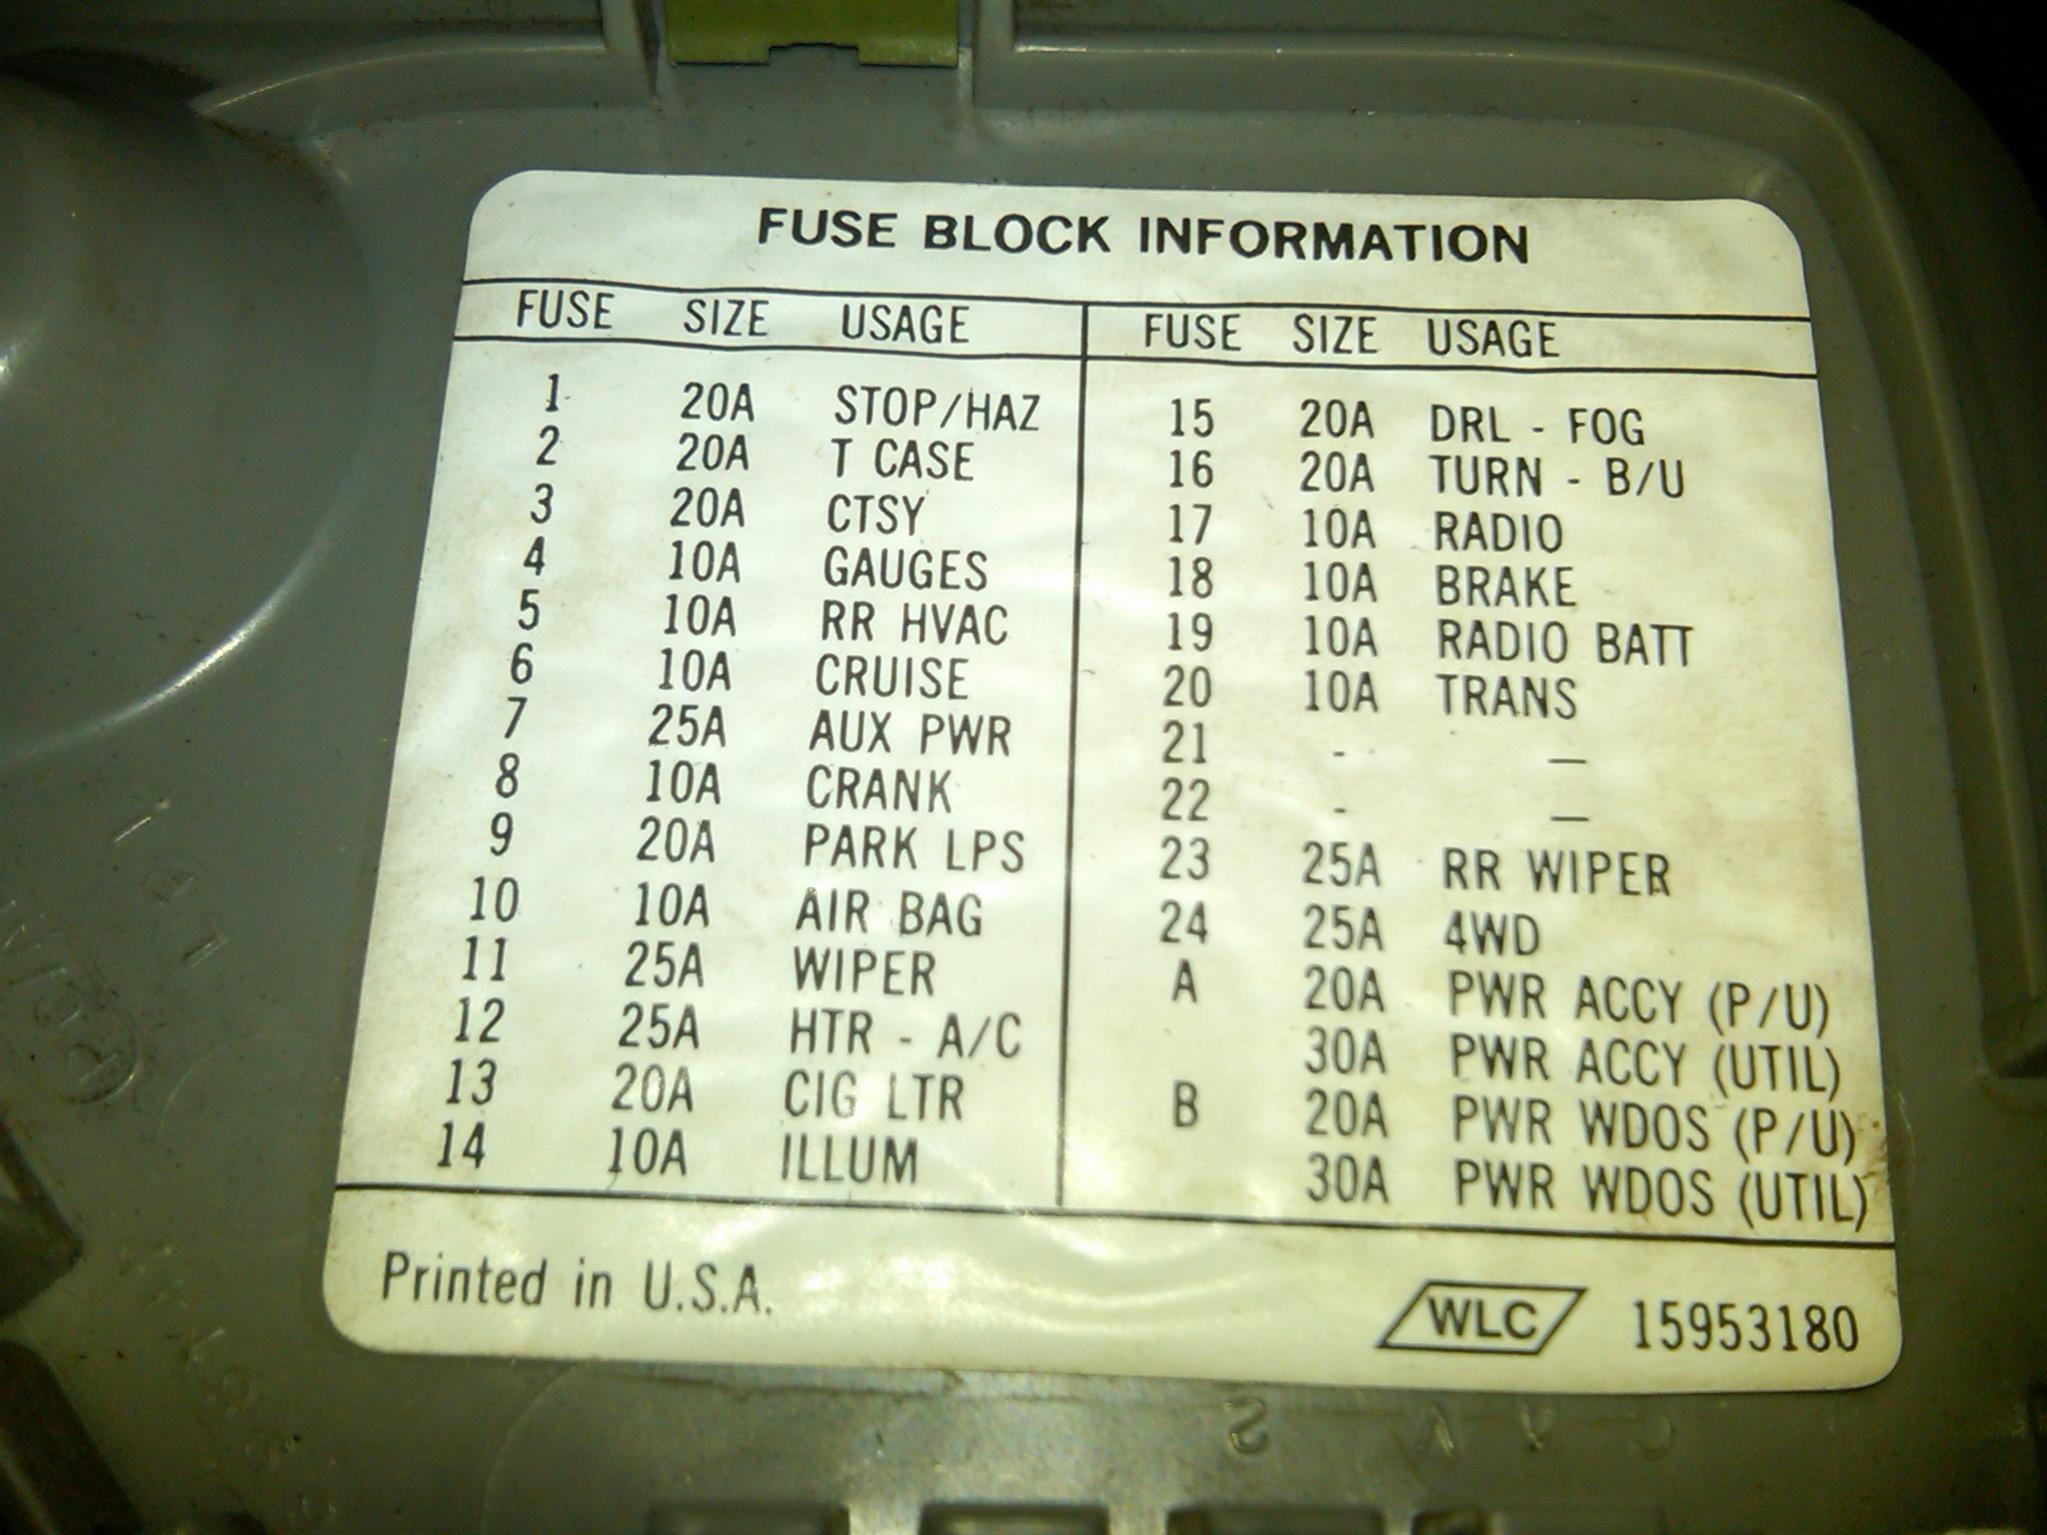 chevrolet 95 beretta fuse box - wiring liry diagram h7 on chevrolet  midnight edition, chevrolet remote 1996